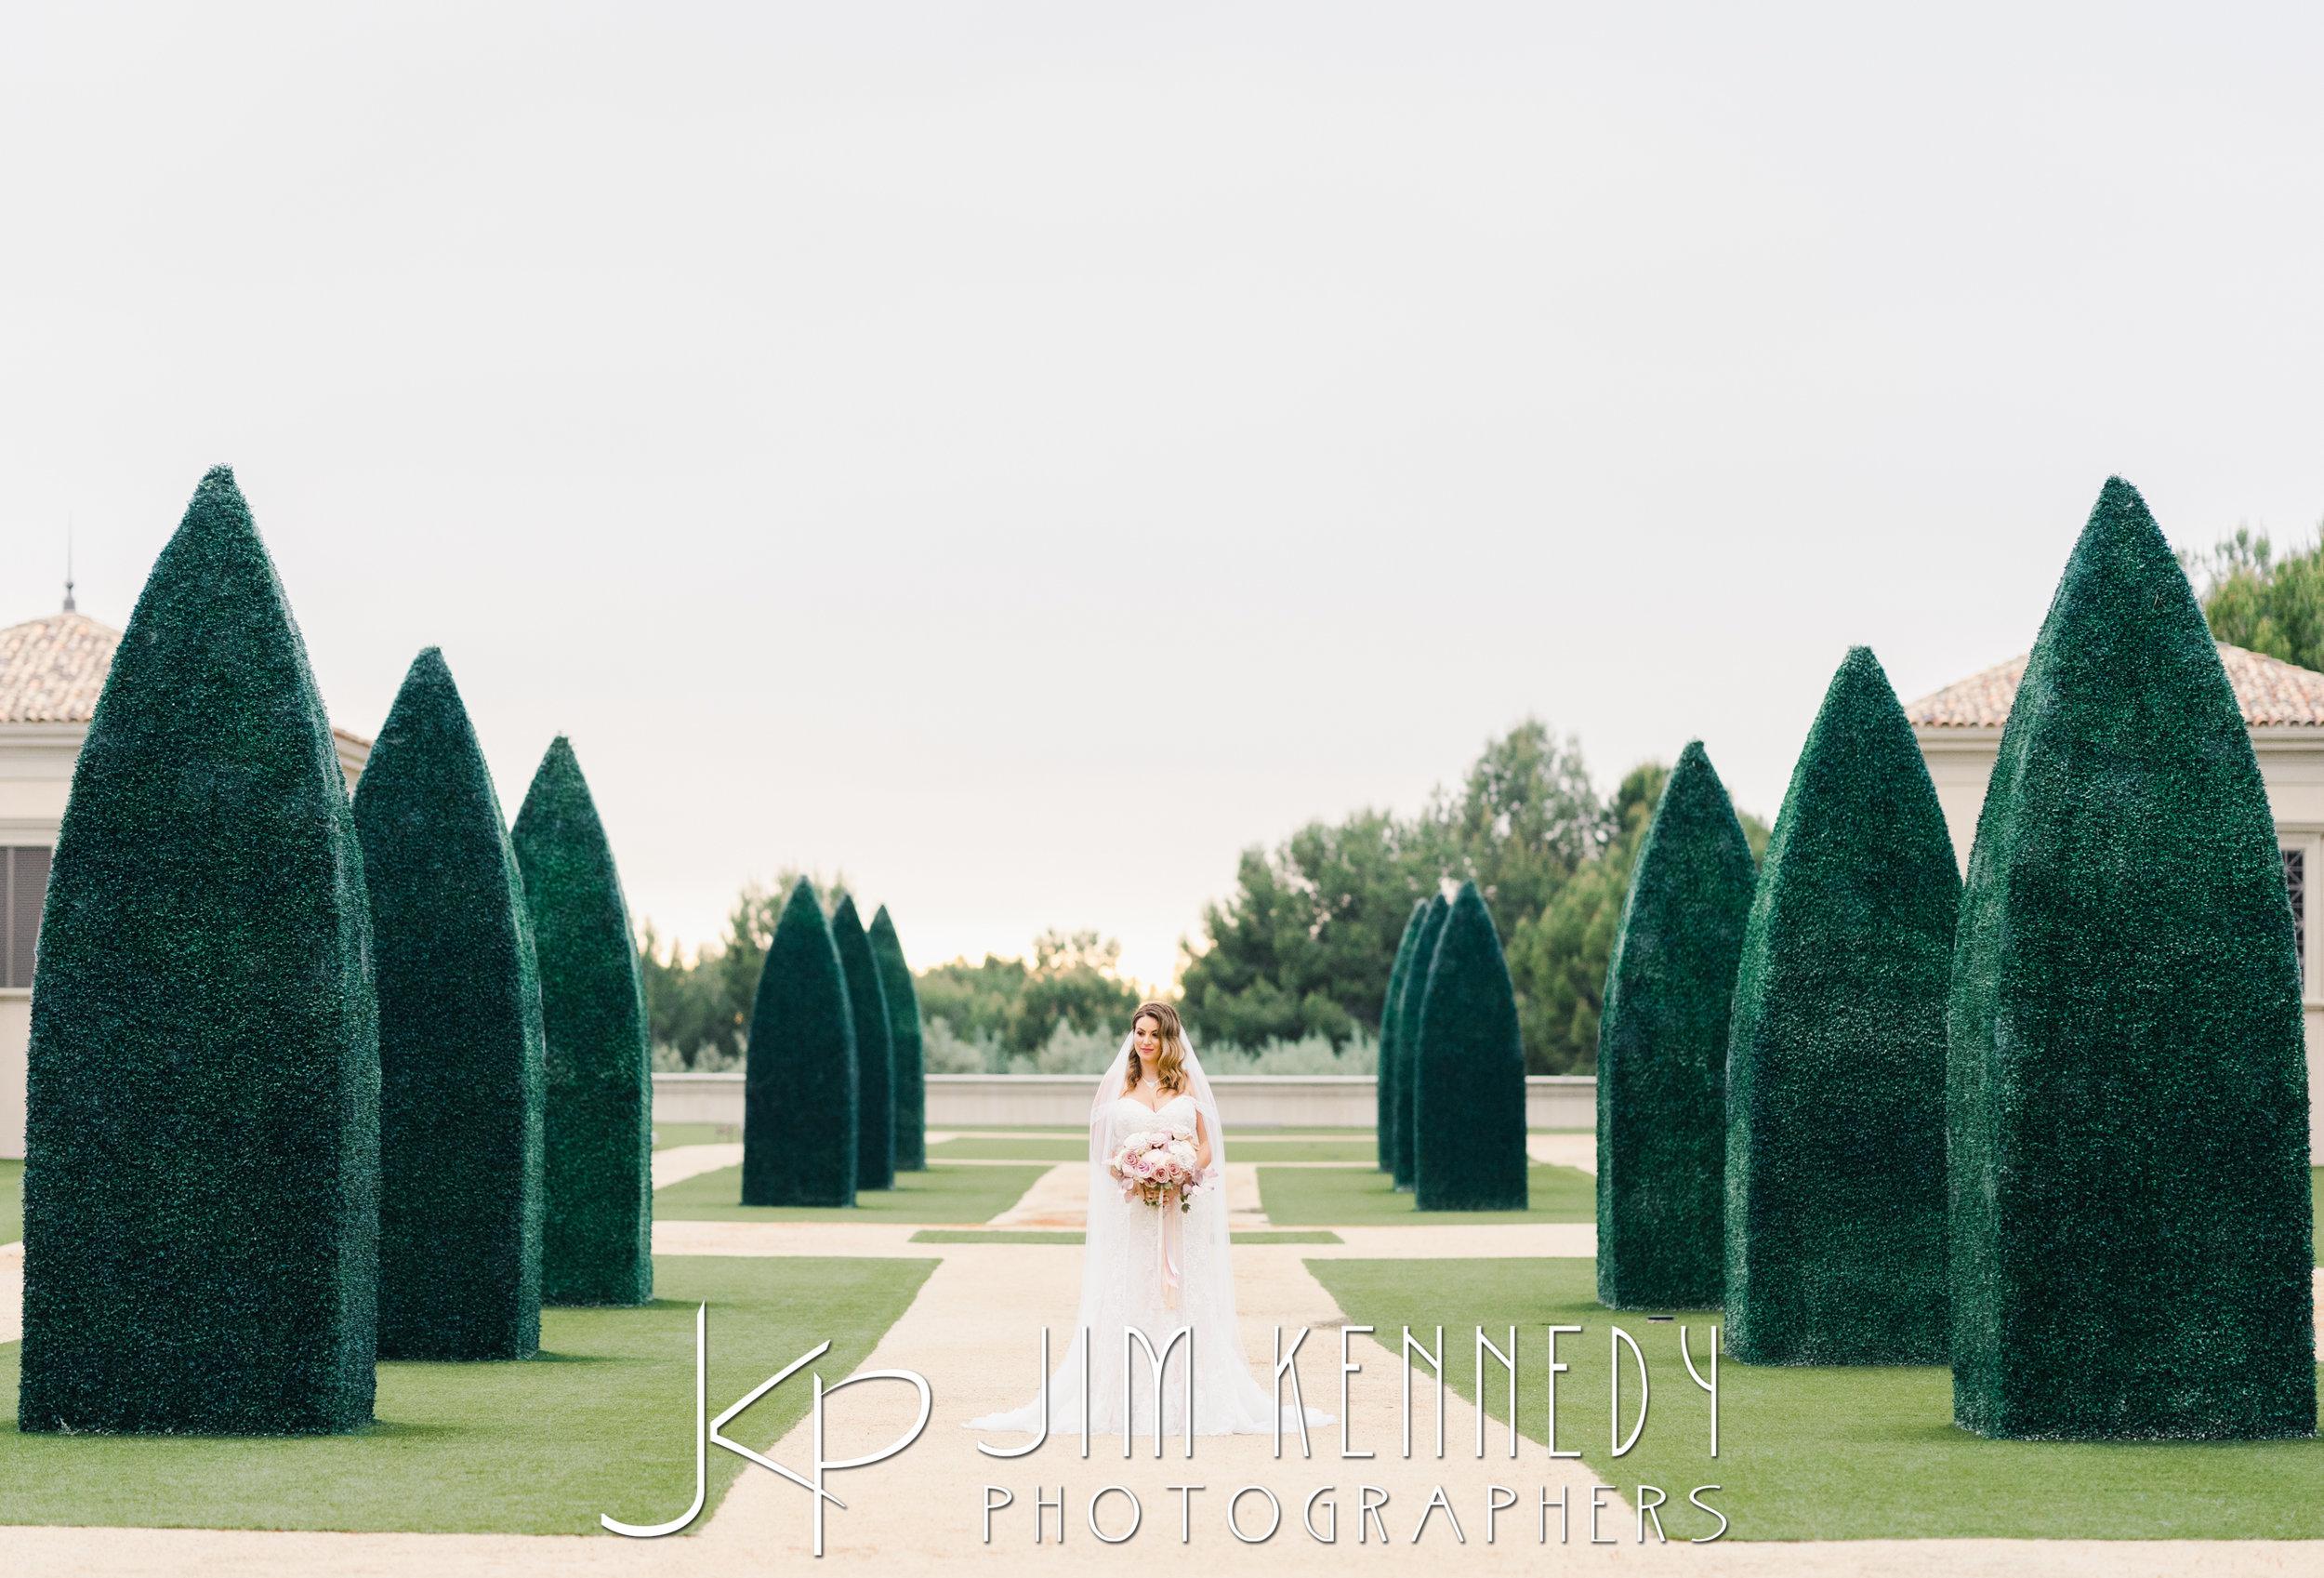 pelican-hill-wedding-jim-kenedy-photographers_0176.JPG